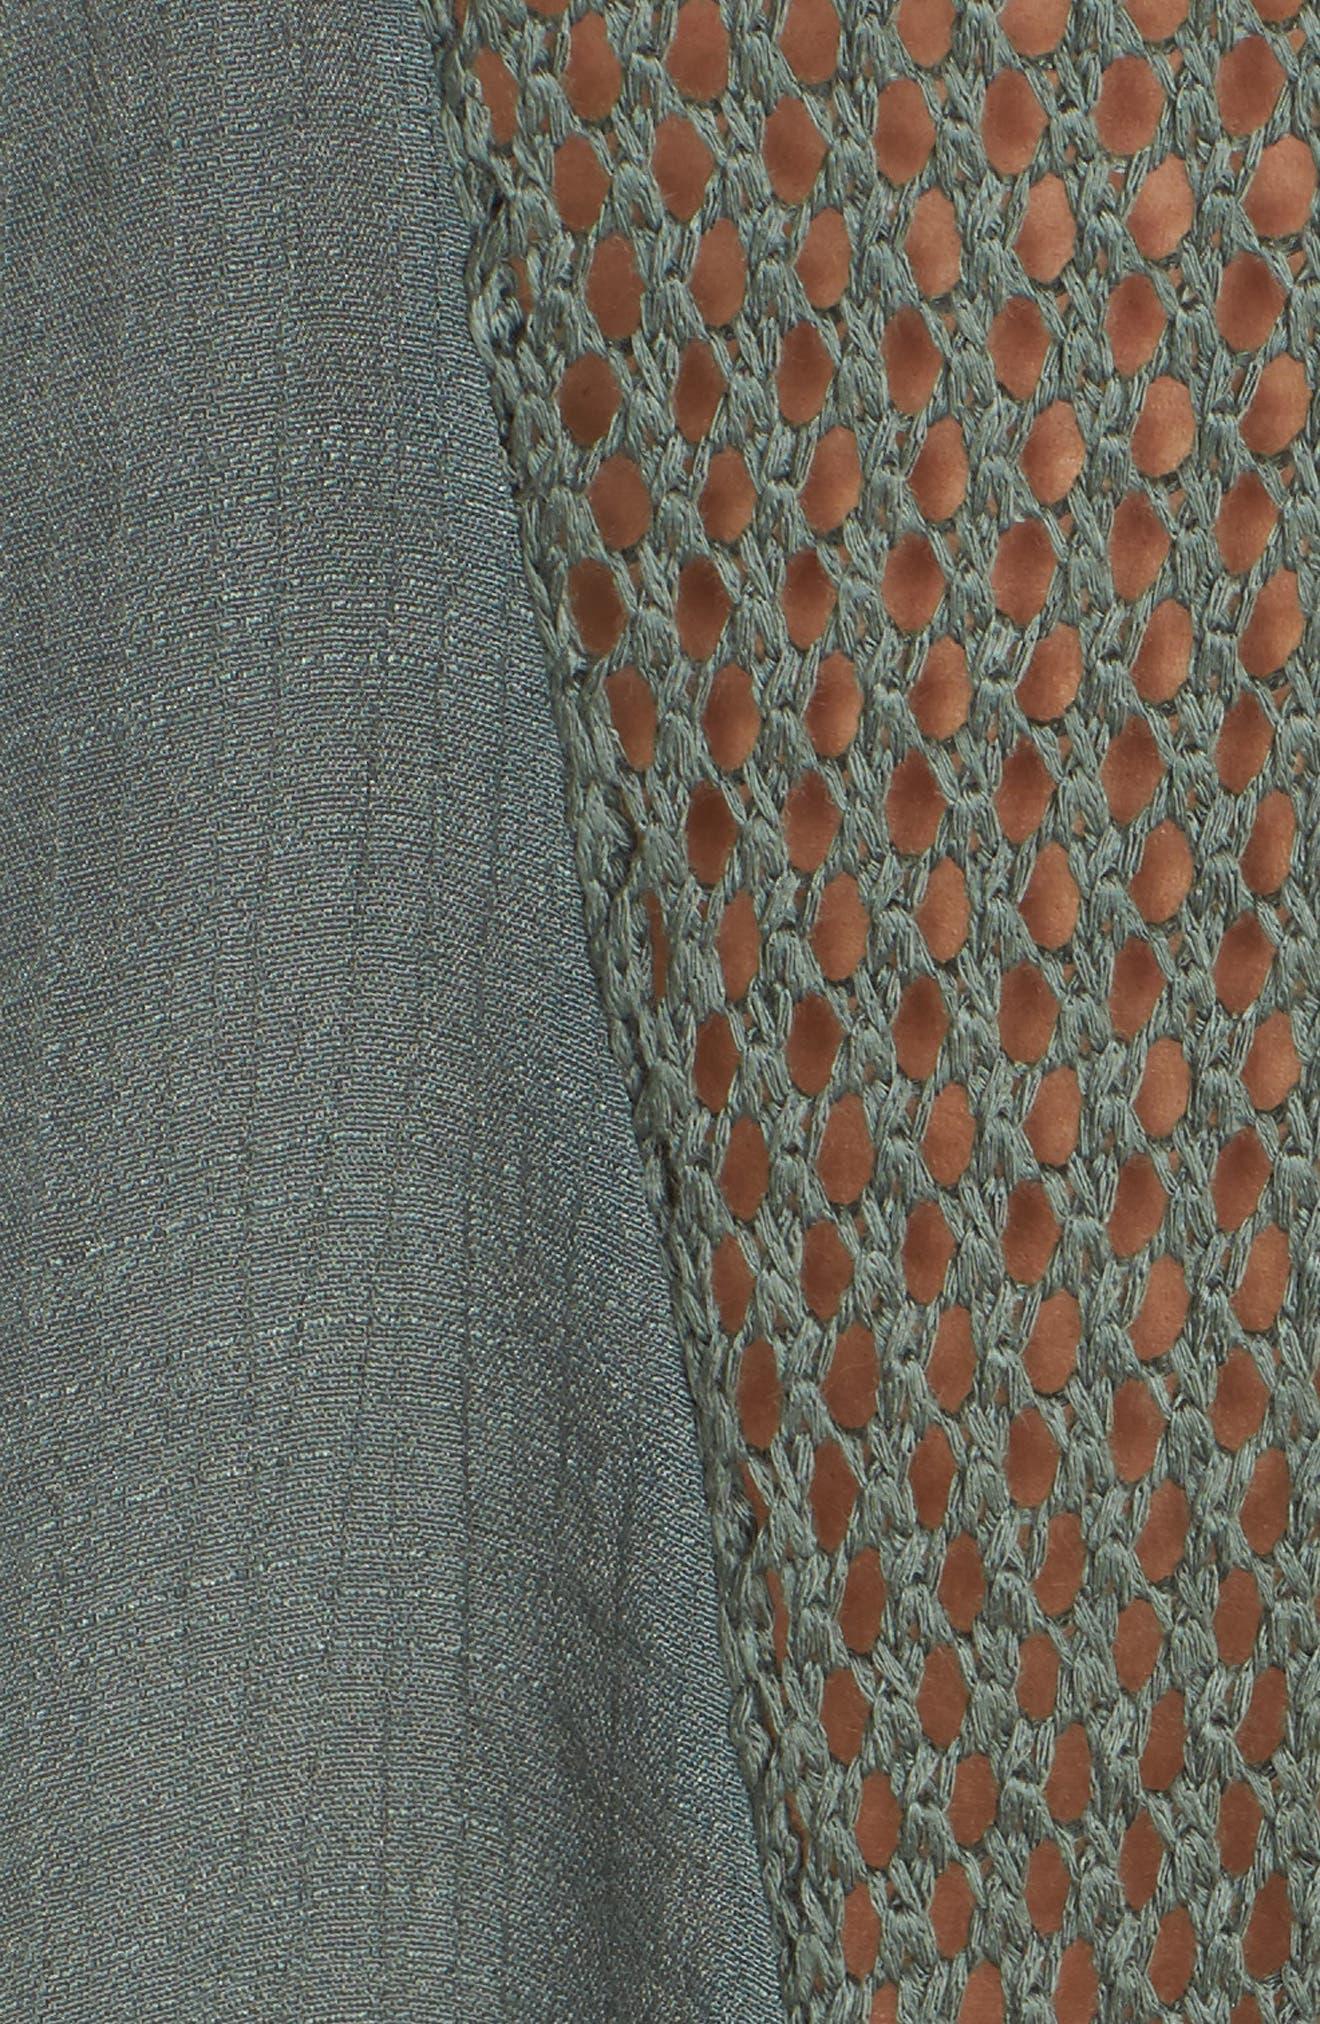 Crochet Inset Cover-Up Dress,                             Alternate thumbnail 5, color,                             Olive